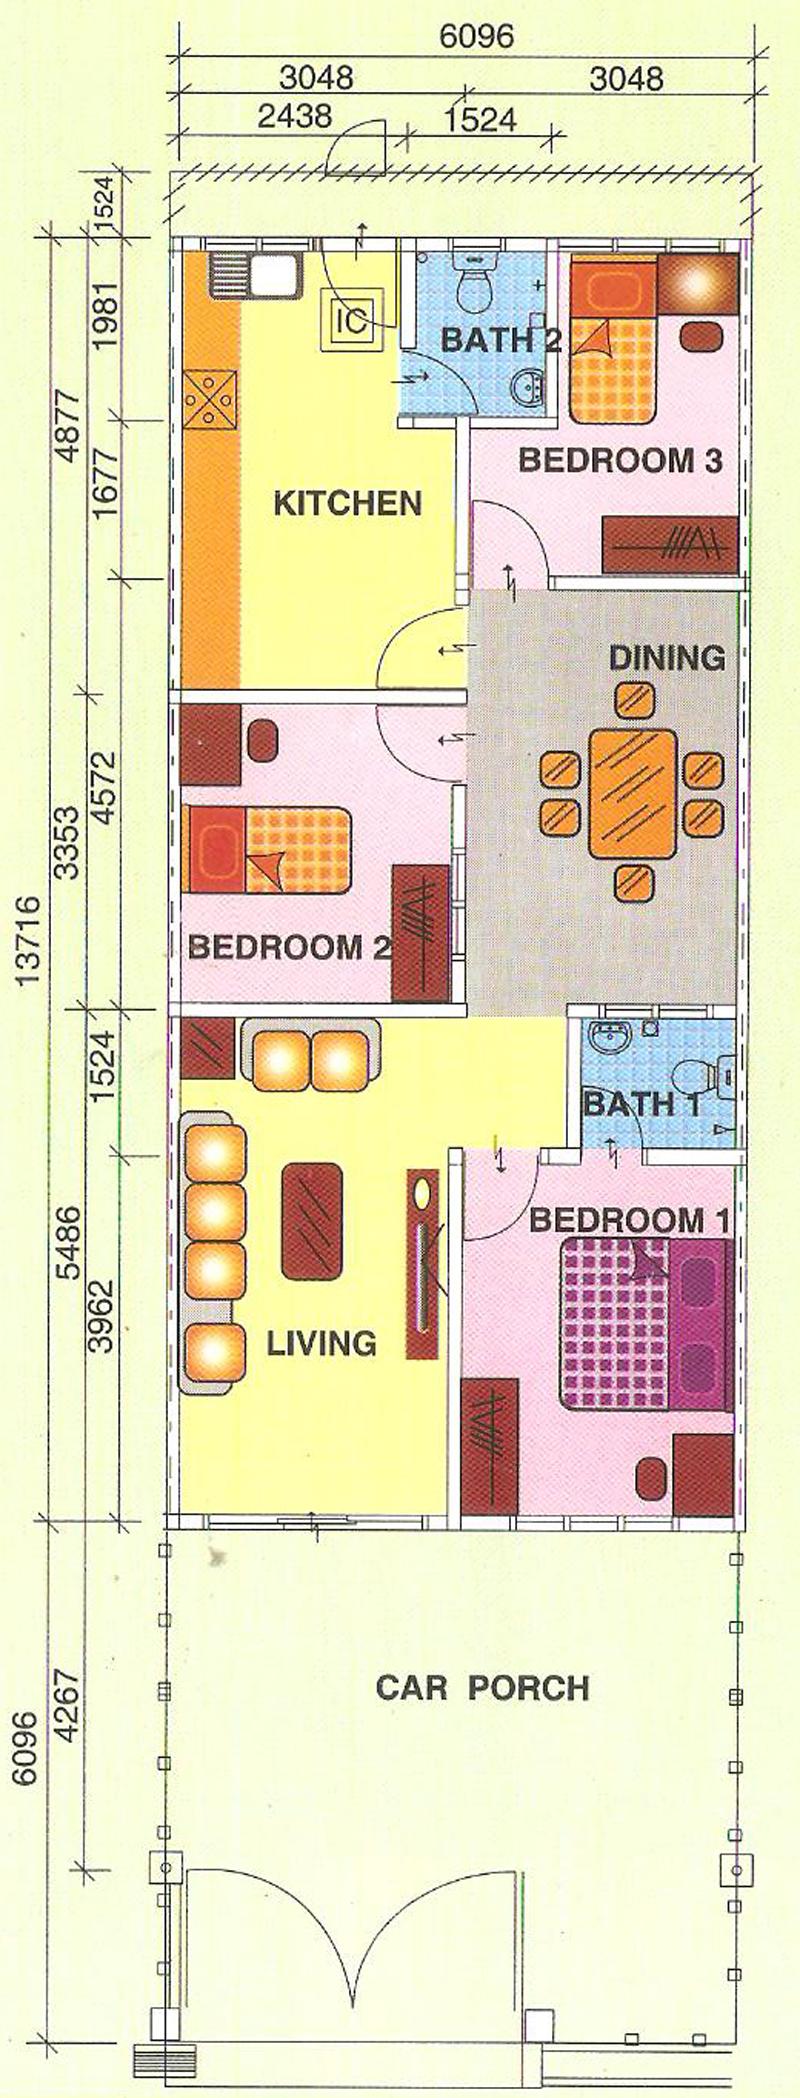 Taman-Pokok-Mangga-floor-plan